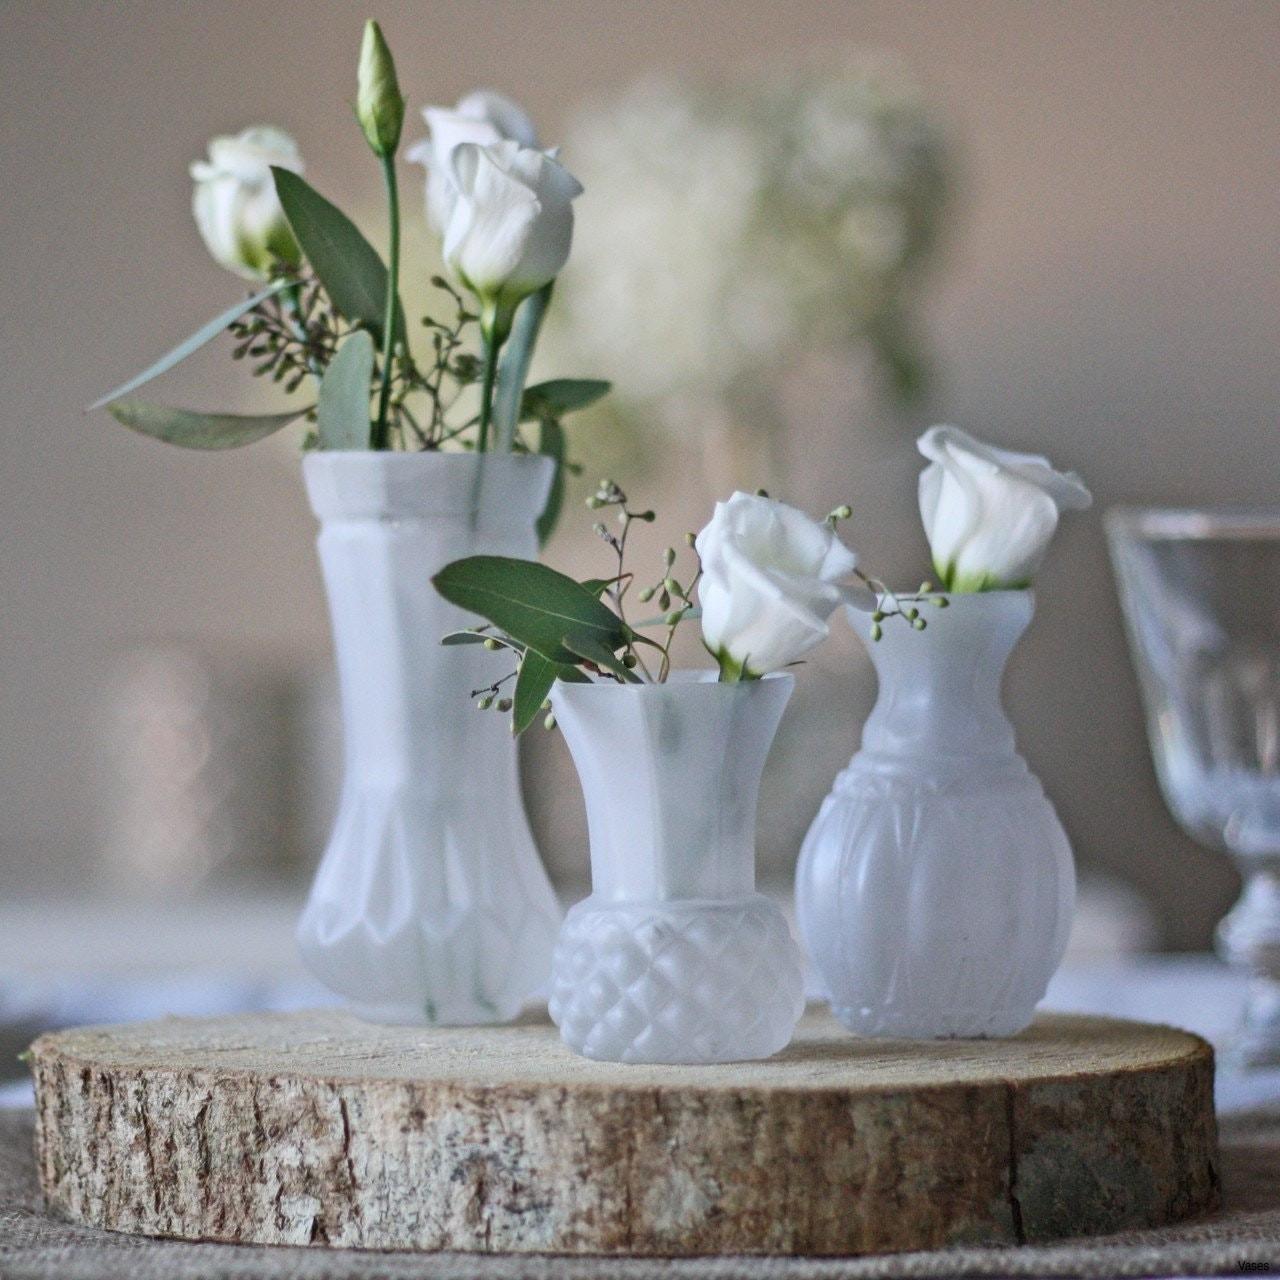 floating candle flower vases of 21 wedding table decorations tall vases italib net regarding wedding table decorations tall vases lovely jar flower 1h vases bud wedding vase centerpiece idea i